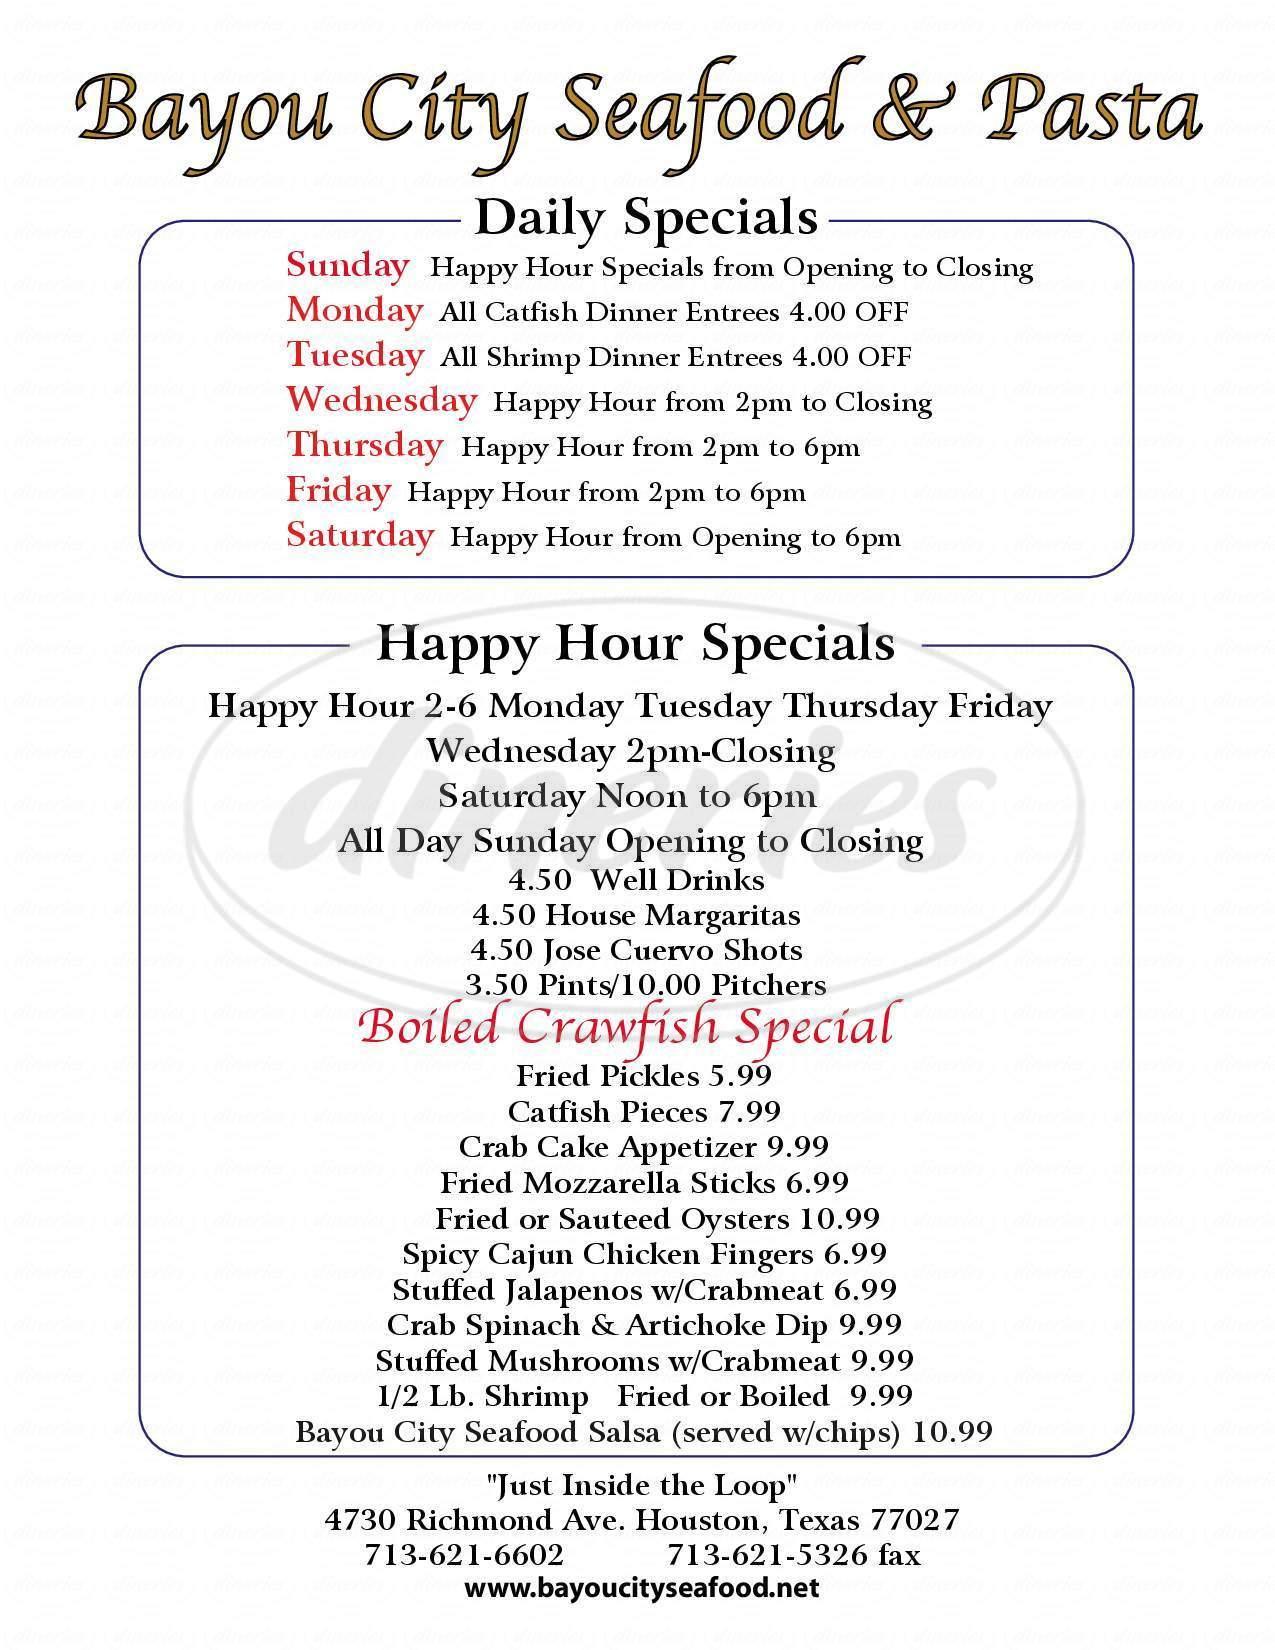 menu for Bayou City Seafood and Pasta